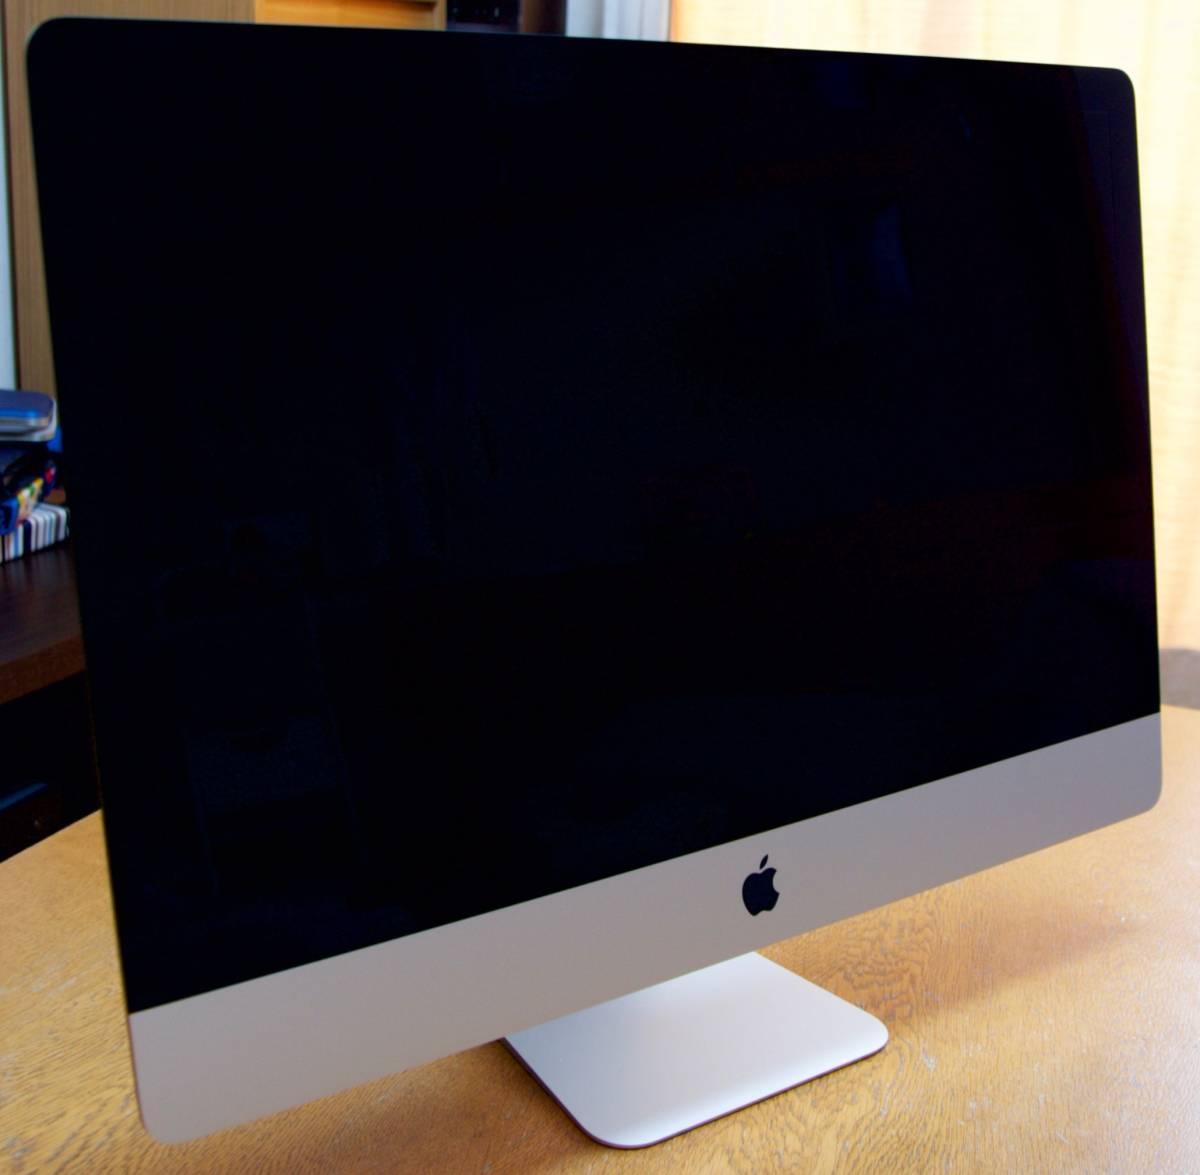 iMac(27inch Late2012) 2.9Ghz Intel Core i5 メモリ24GB 3TBHD キーボード,TrackPad未使